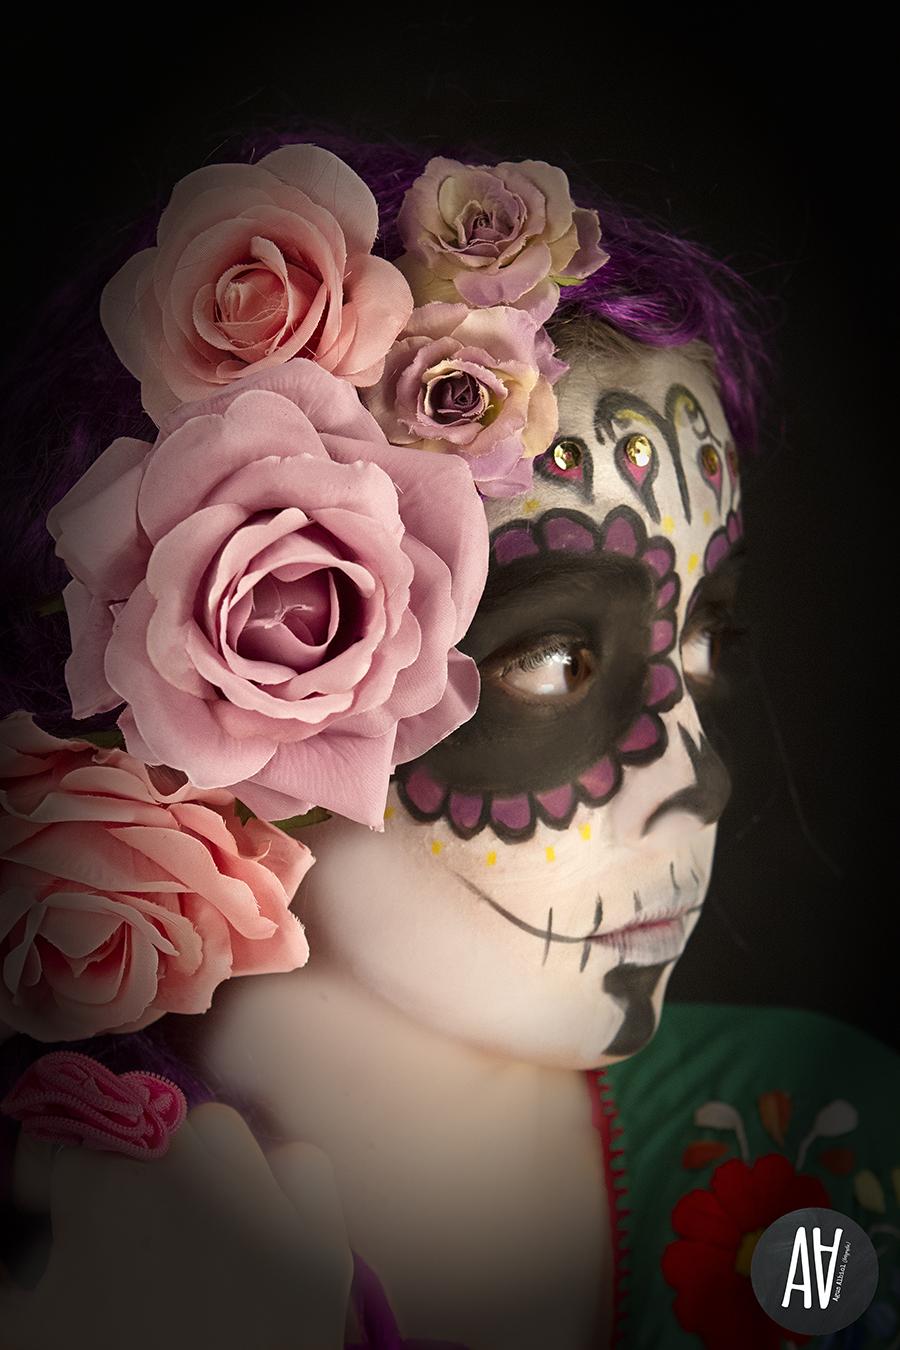 Sesiones de estudio maquillaje sesiones espciales agusalbiol fotografia locuras de agus albiol fotografia bfotografa barcelona tona.2